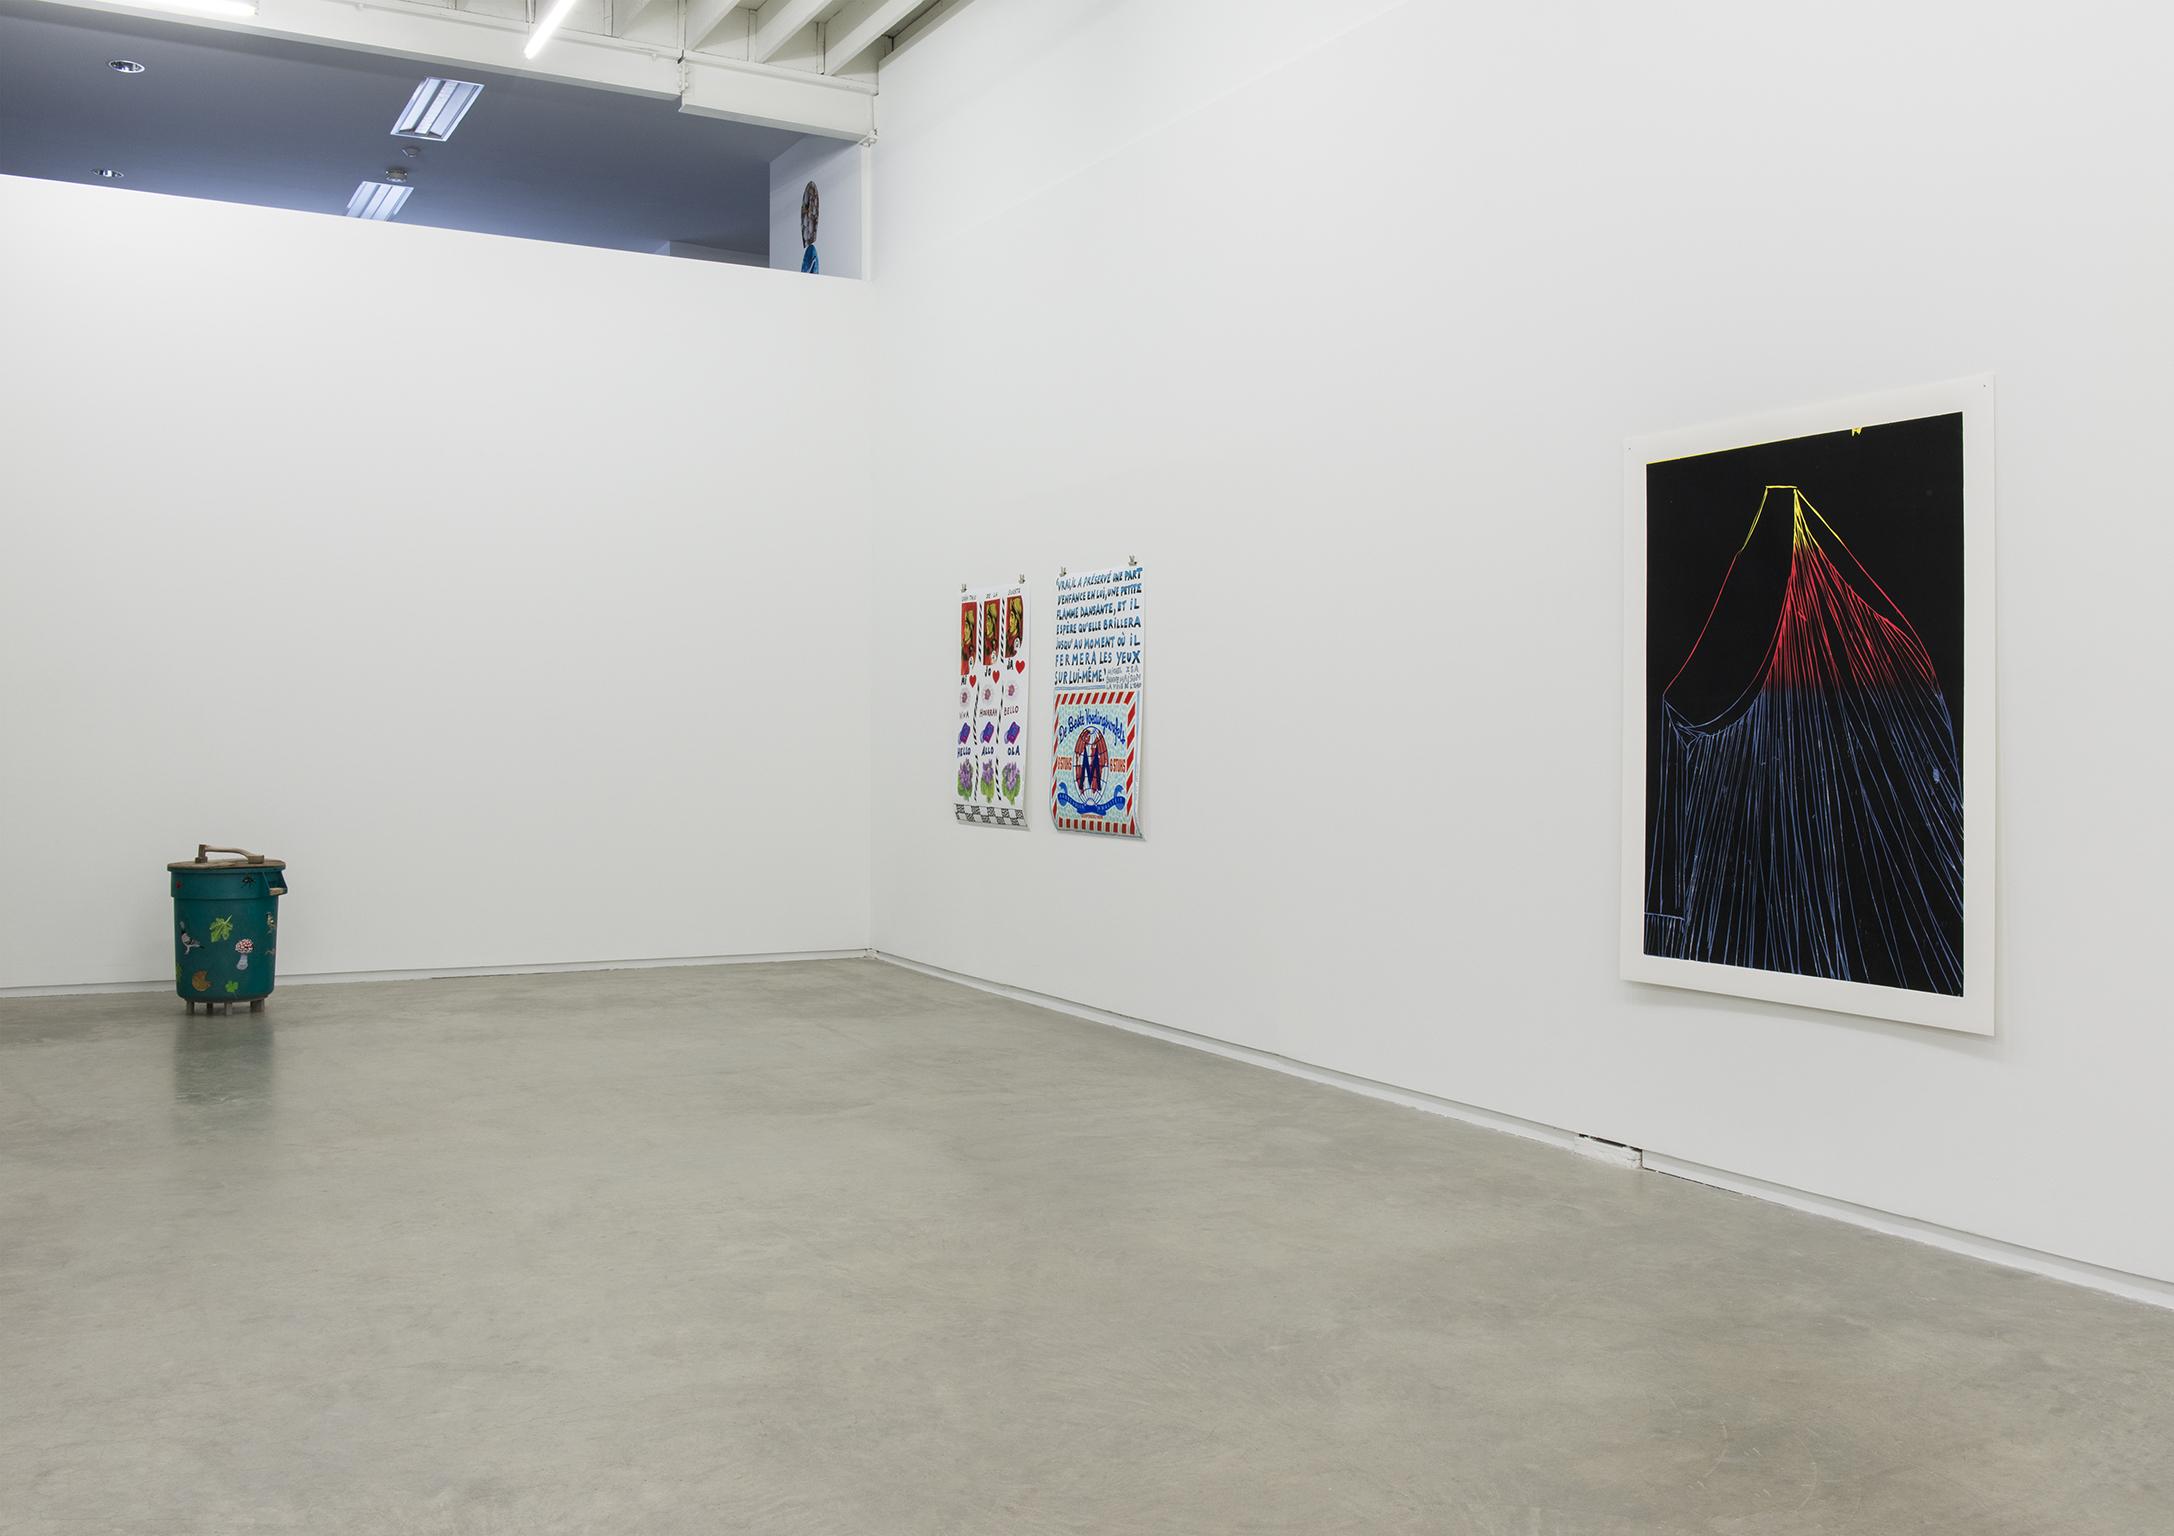 Andrea Büttner, Joëlle de La Casinière, Gareth Moore, installation view, 2013 by